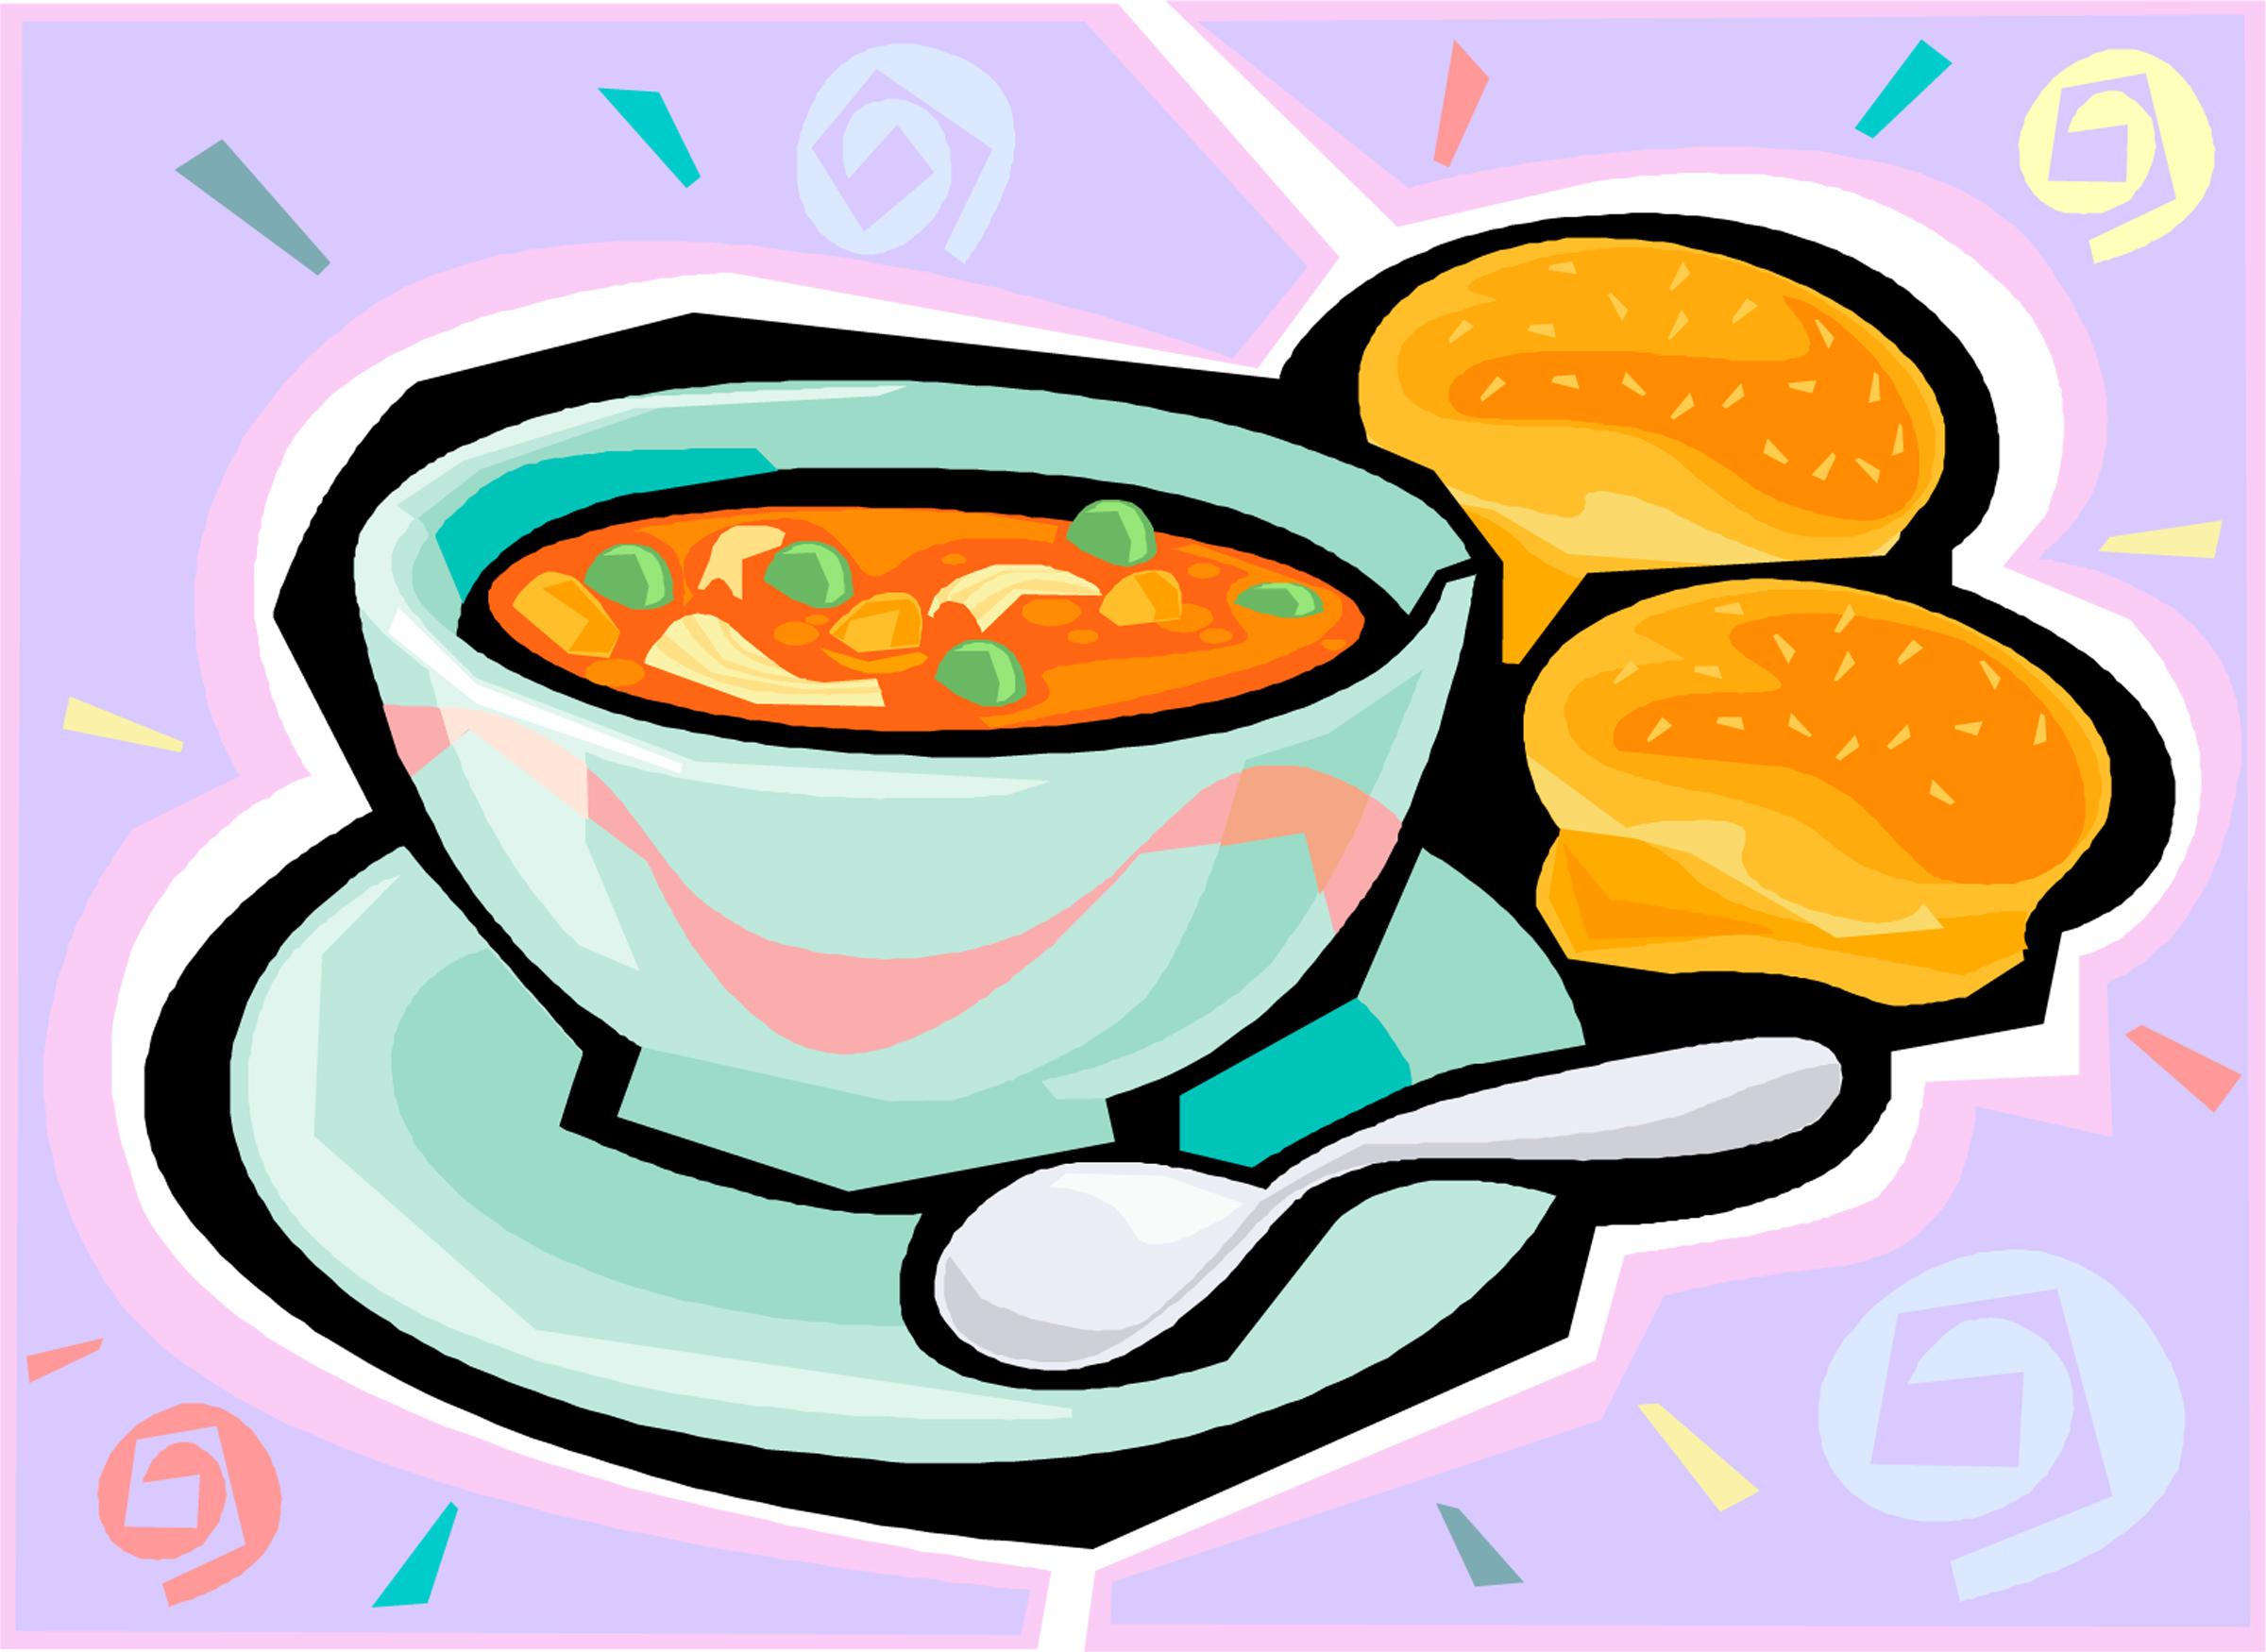 2400x1750 Chili Clipart Chili Soup